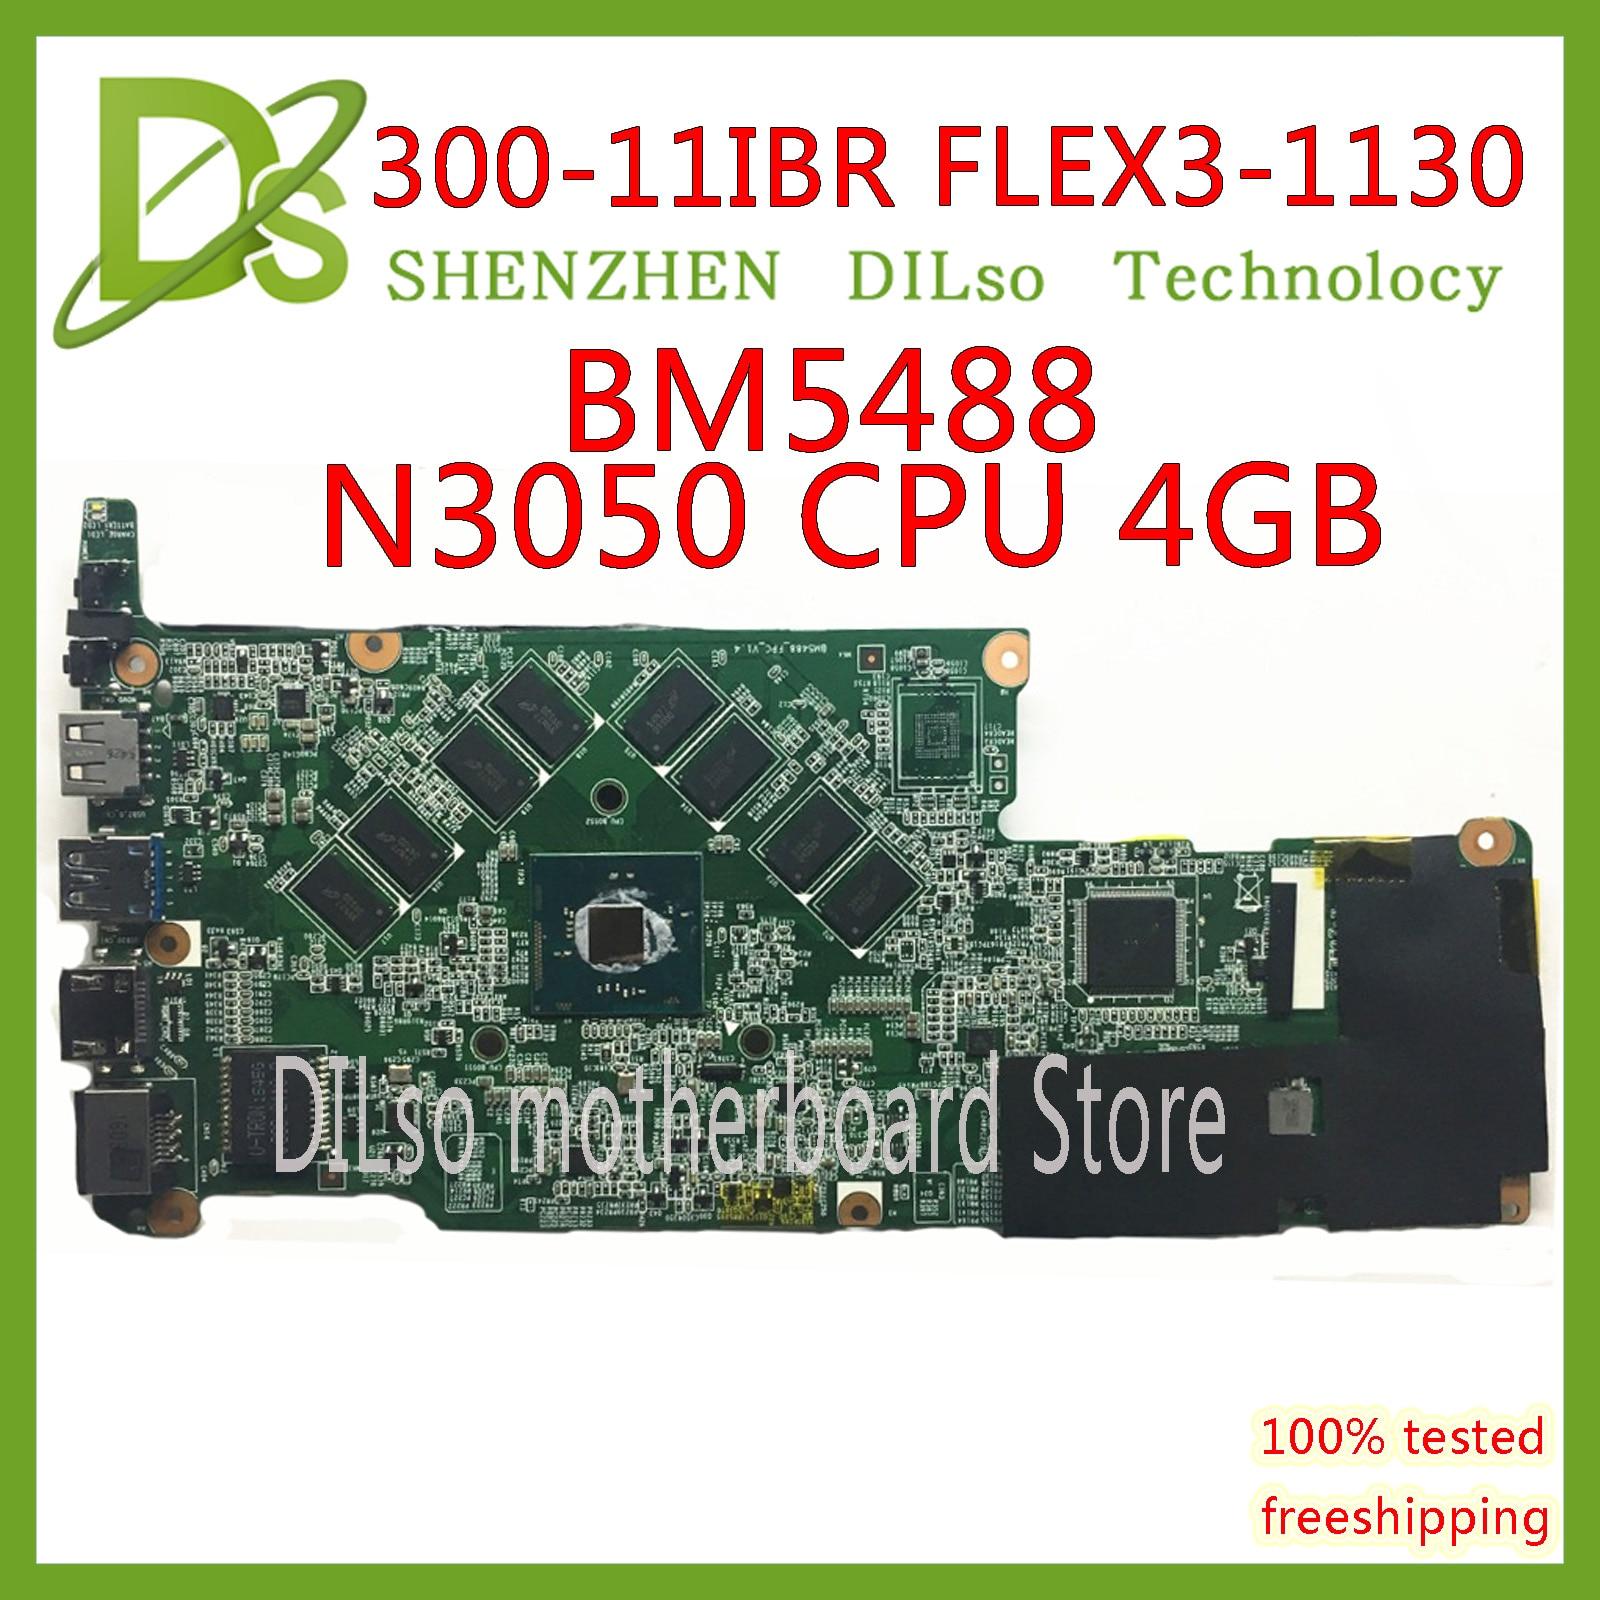 KEFU 300-11IBR اللوحة الرئيسية لينوفو اليوغا 300-11IBR FLEX3-1130 اللوحة الأم وحدة المعالجة المركزية N3050 4GB RAM اختبار العمل 100% الأصلي